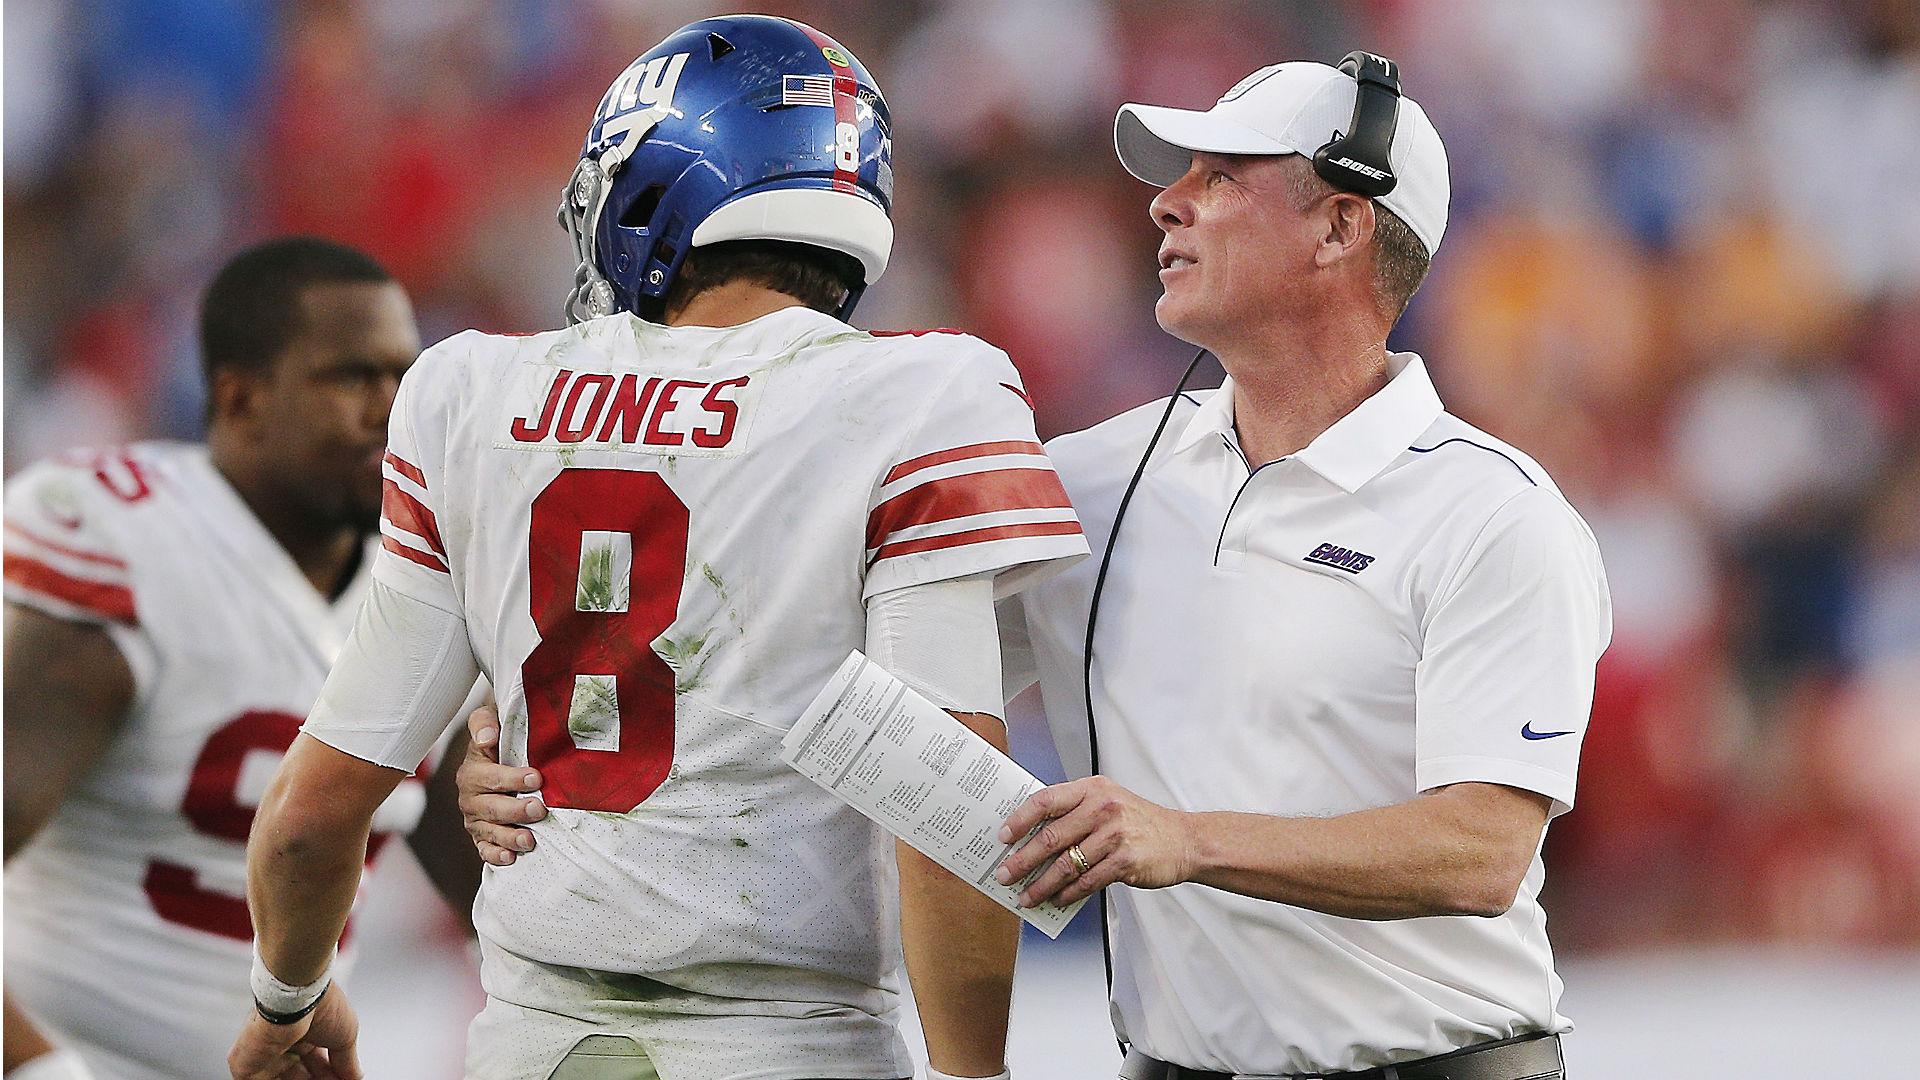 Giants' Shurmur on Daniel Jones